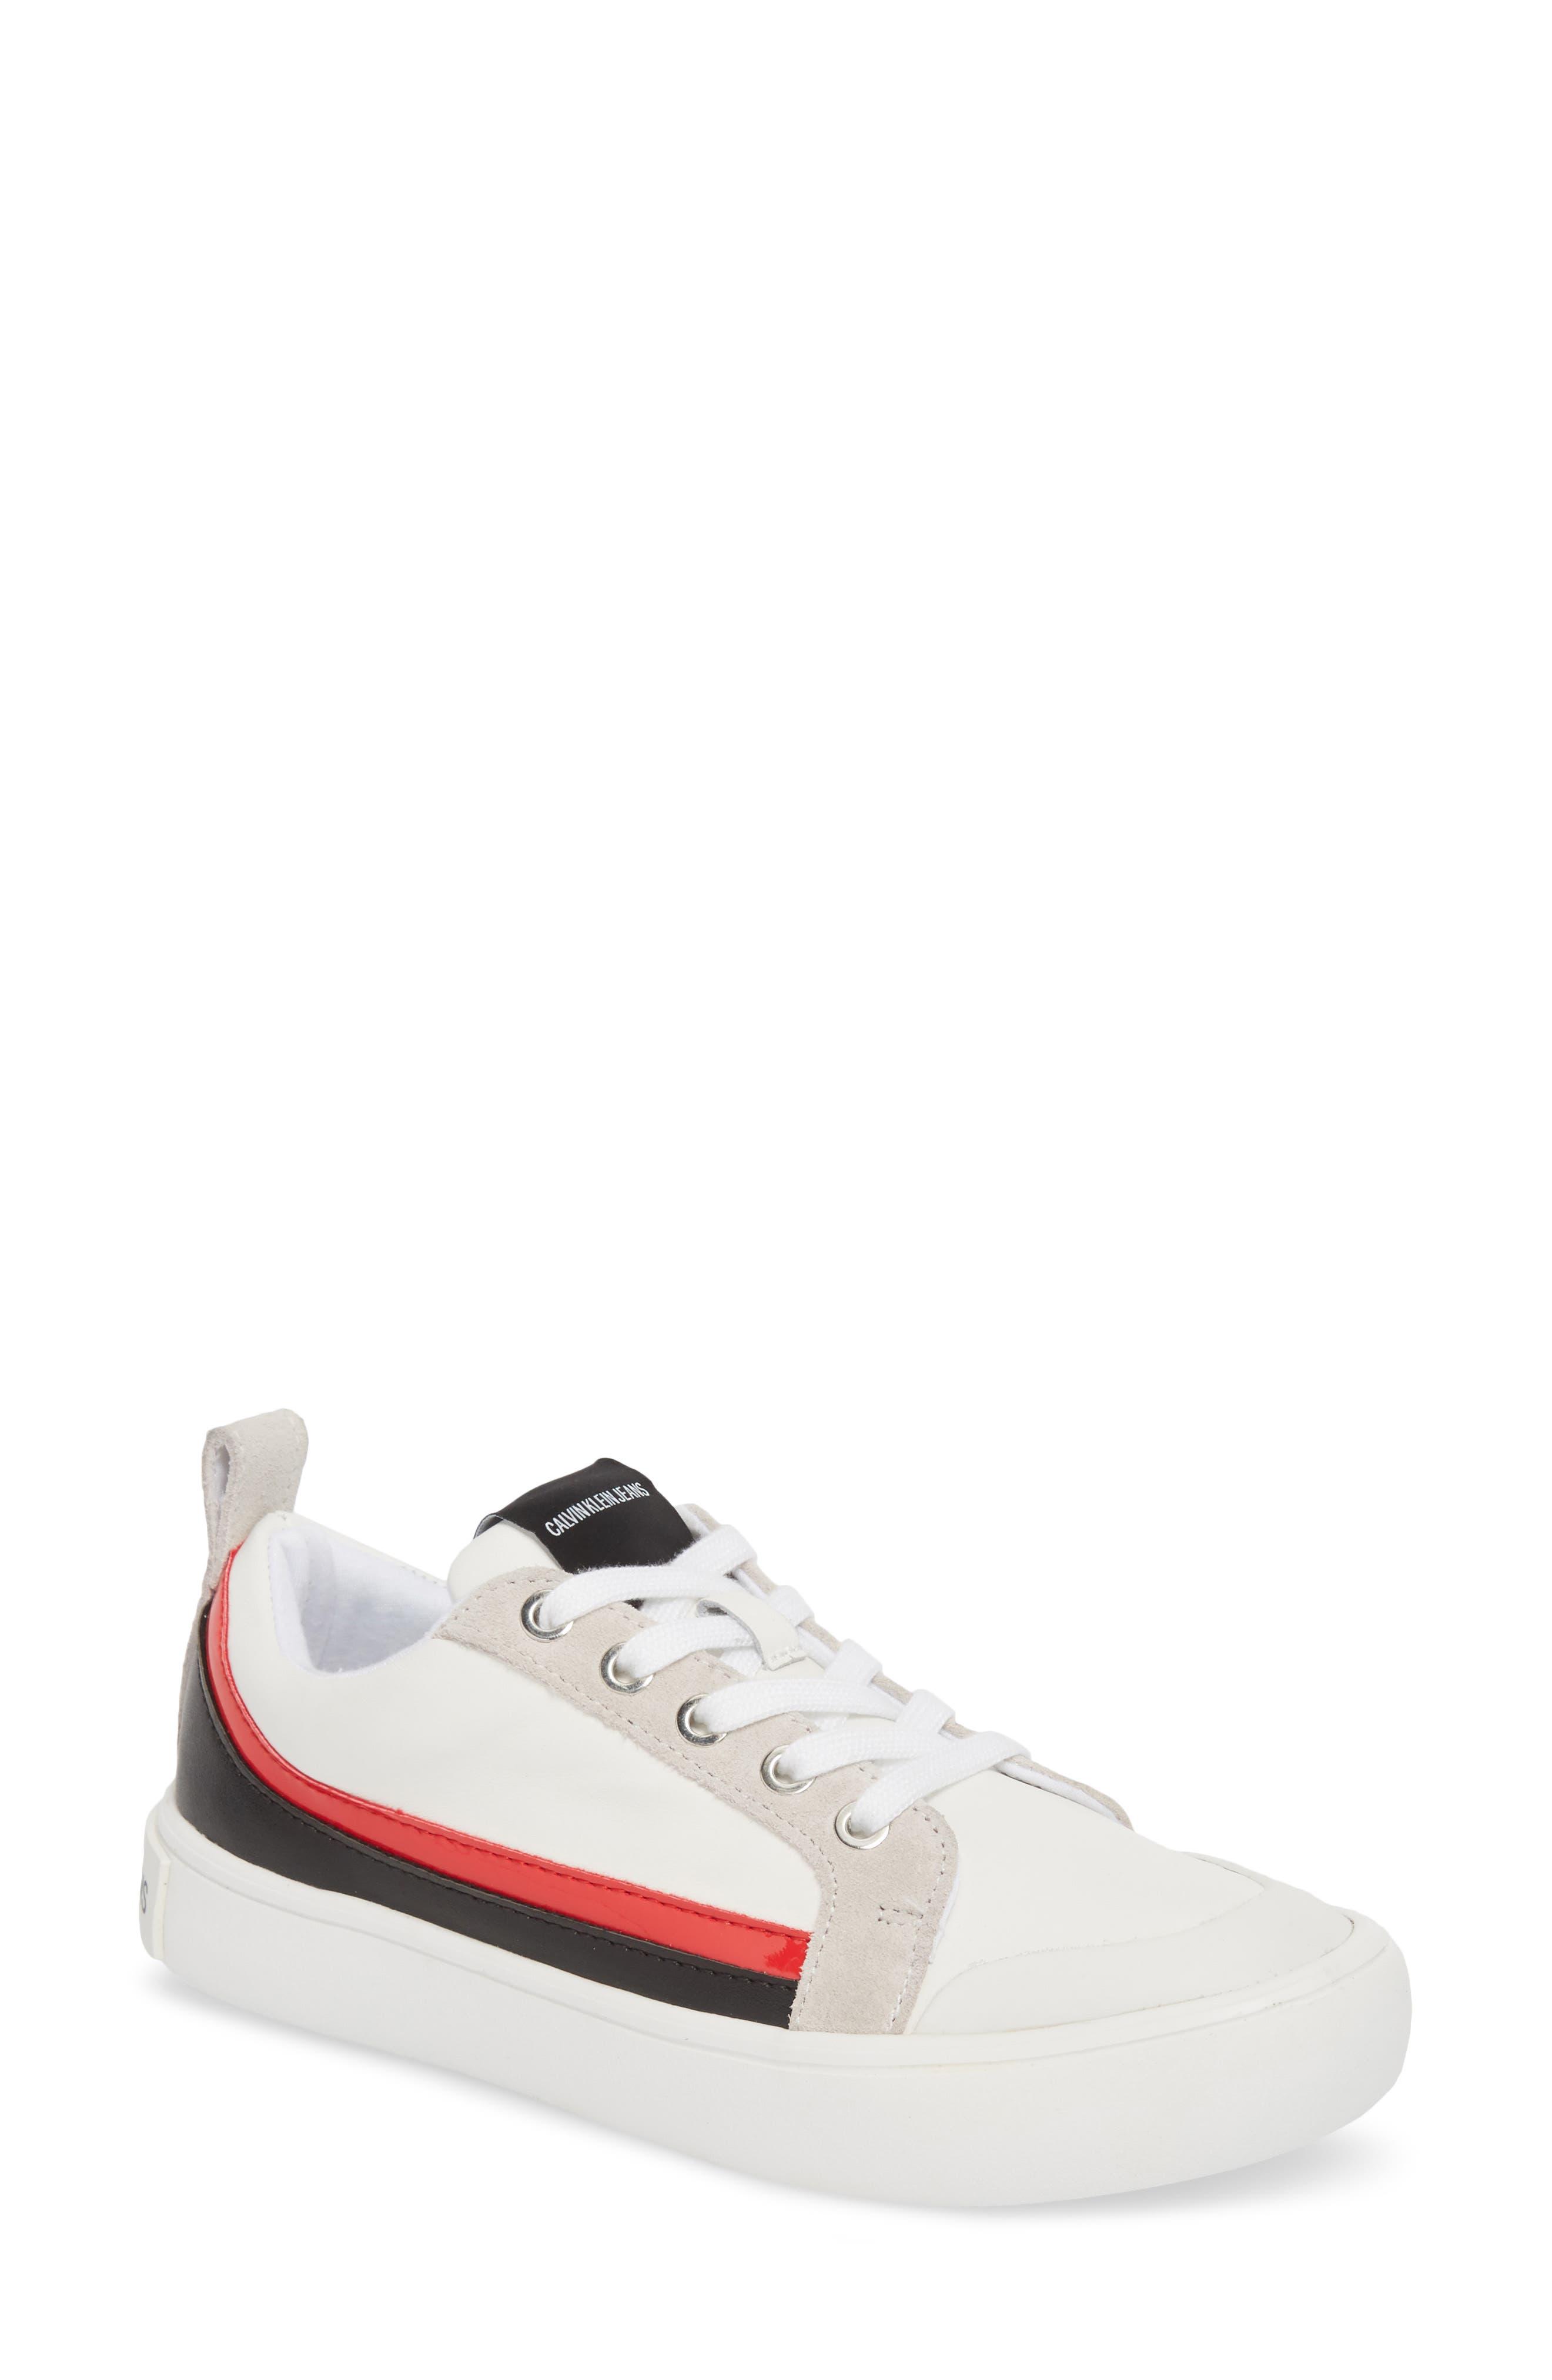 Dodie Sneaker,                             Main thumbnail 1, color,                             WHITE/ BLACK/ TOMATO